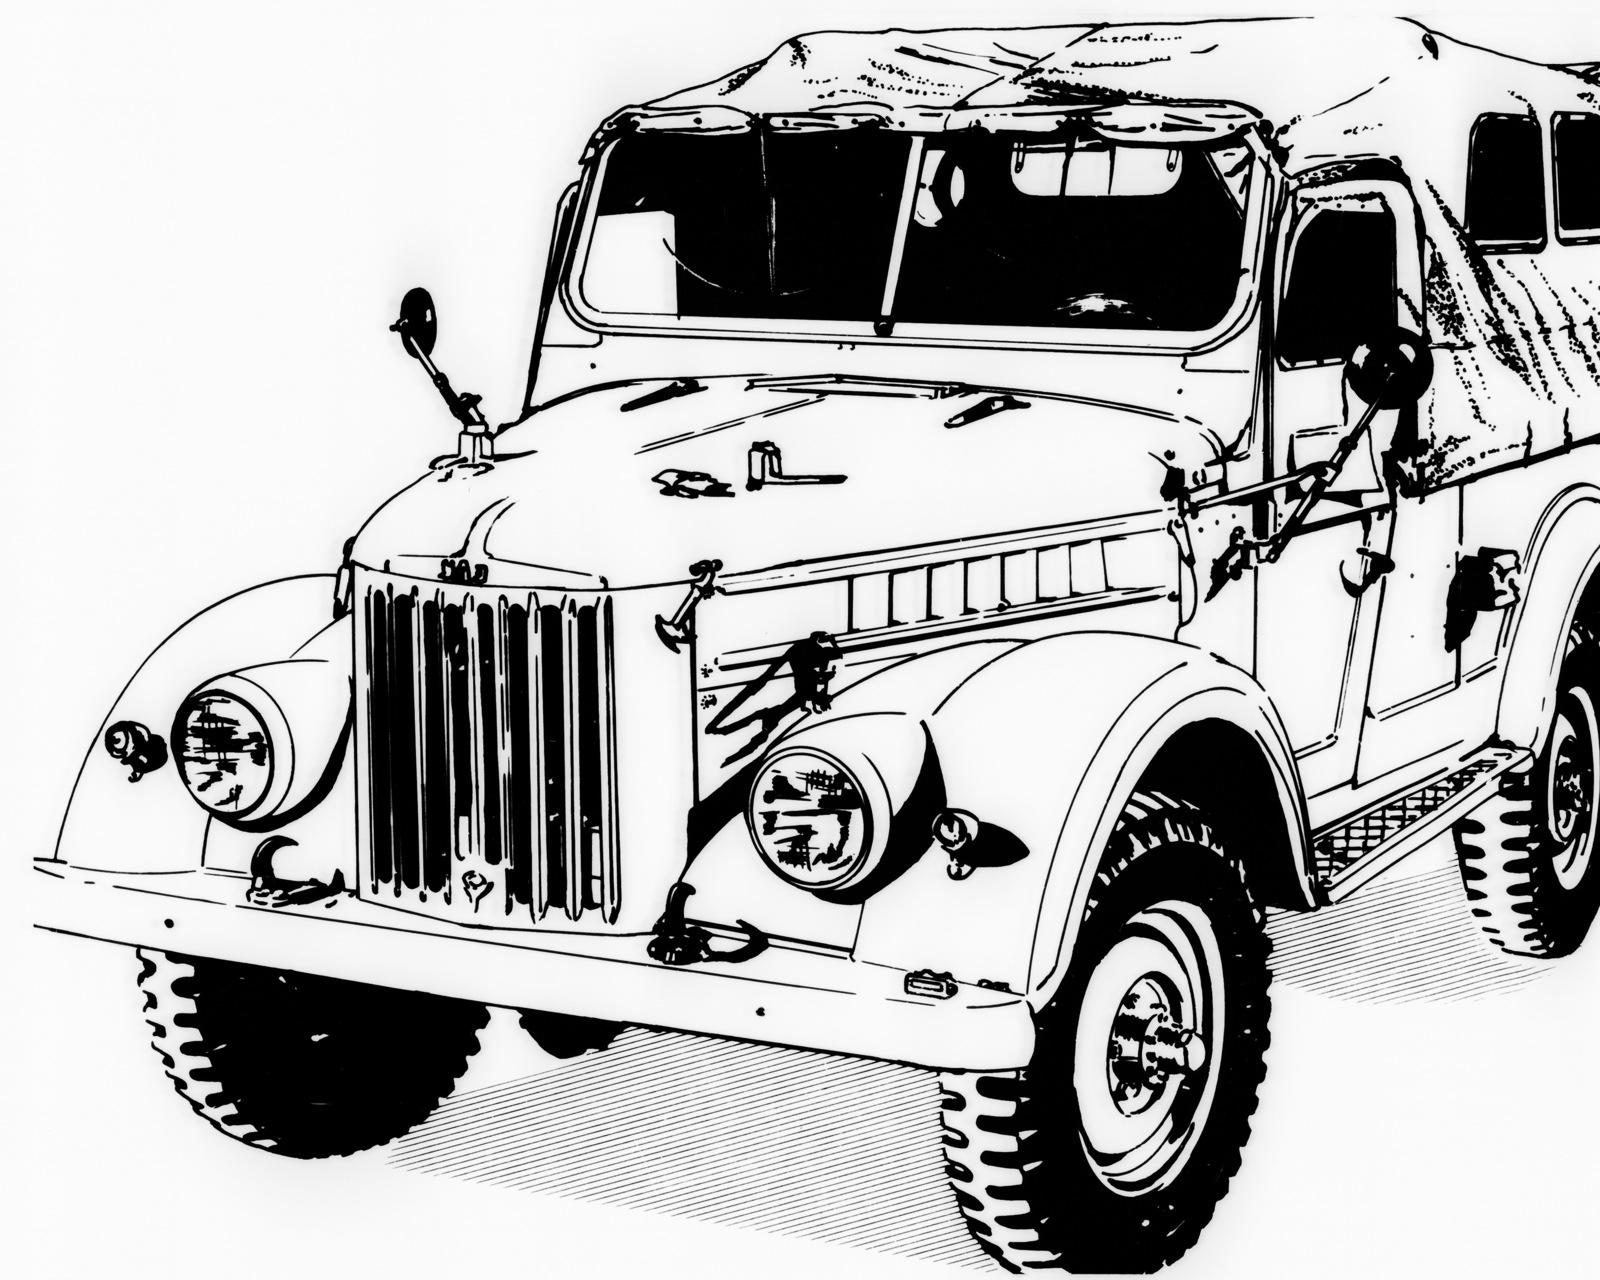 1953 m38a1 jeep diagram wiring diagram database 1962 Jeep CJ 5 m38a1 hood wiring diagram database 1953 jeep truck 1953 m38a1 jeep diagram